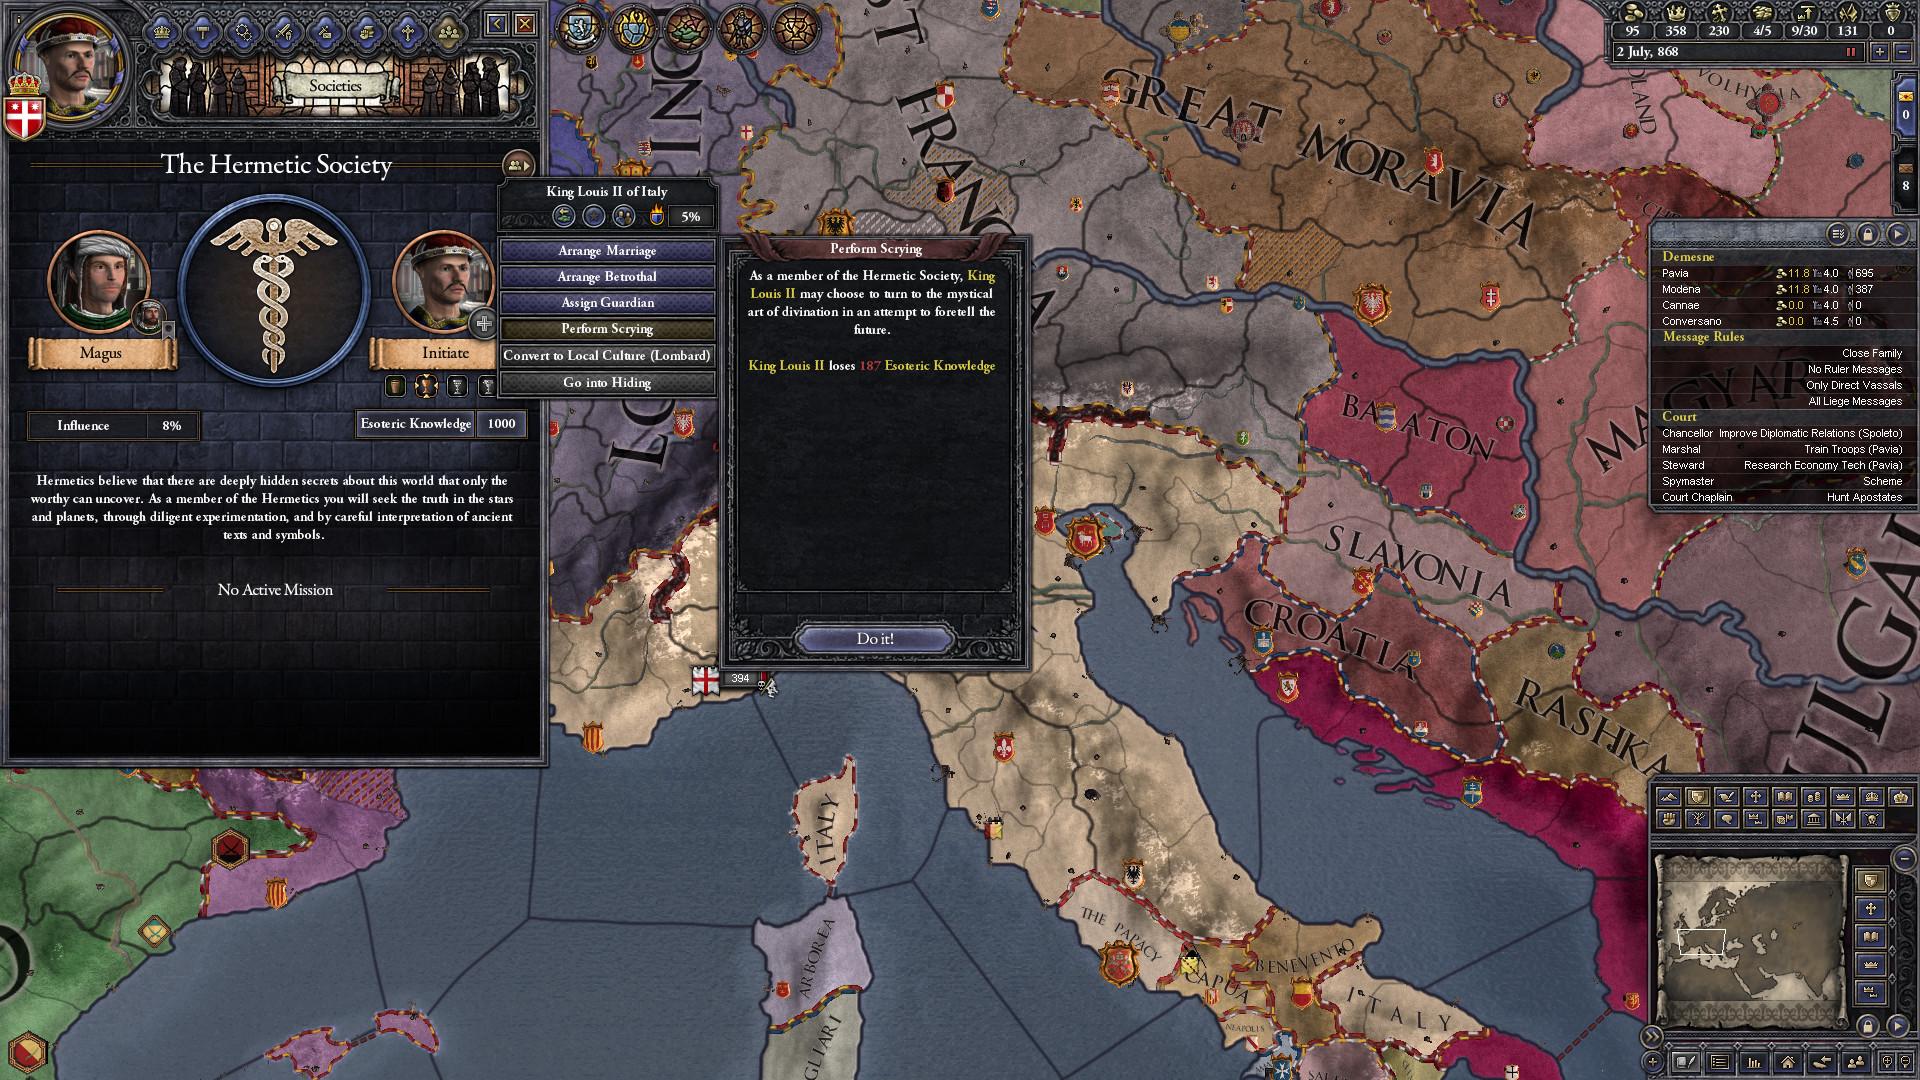 Crusader Kings II: Monks and Mystics Screenshot 2